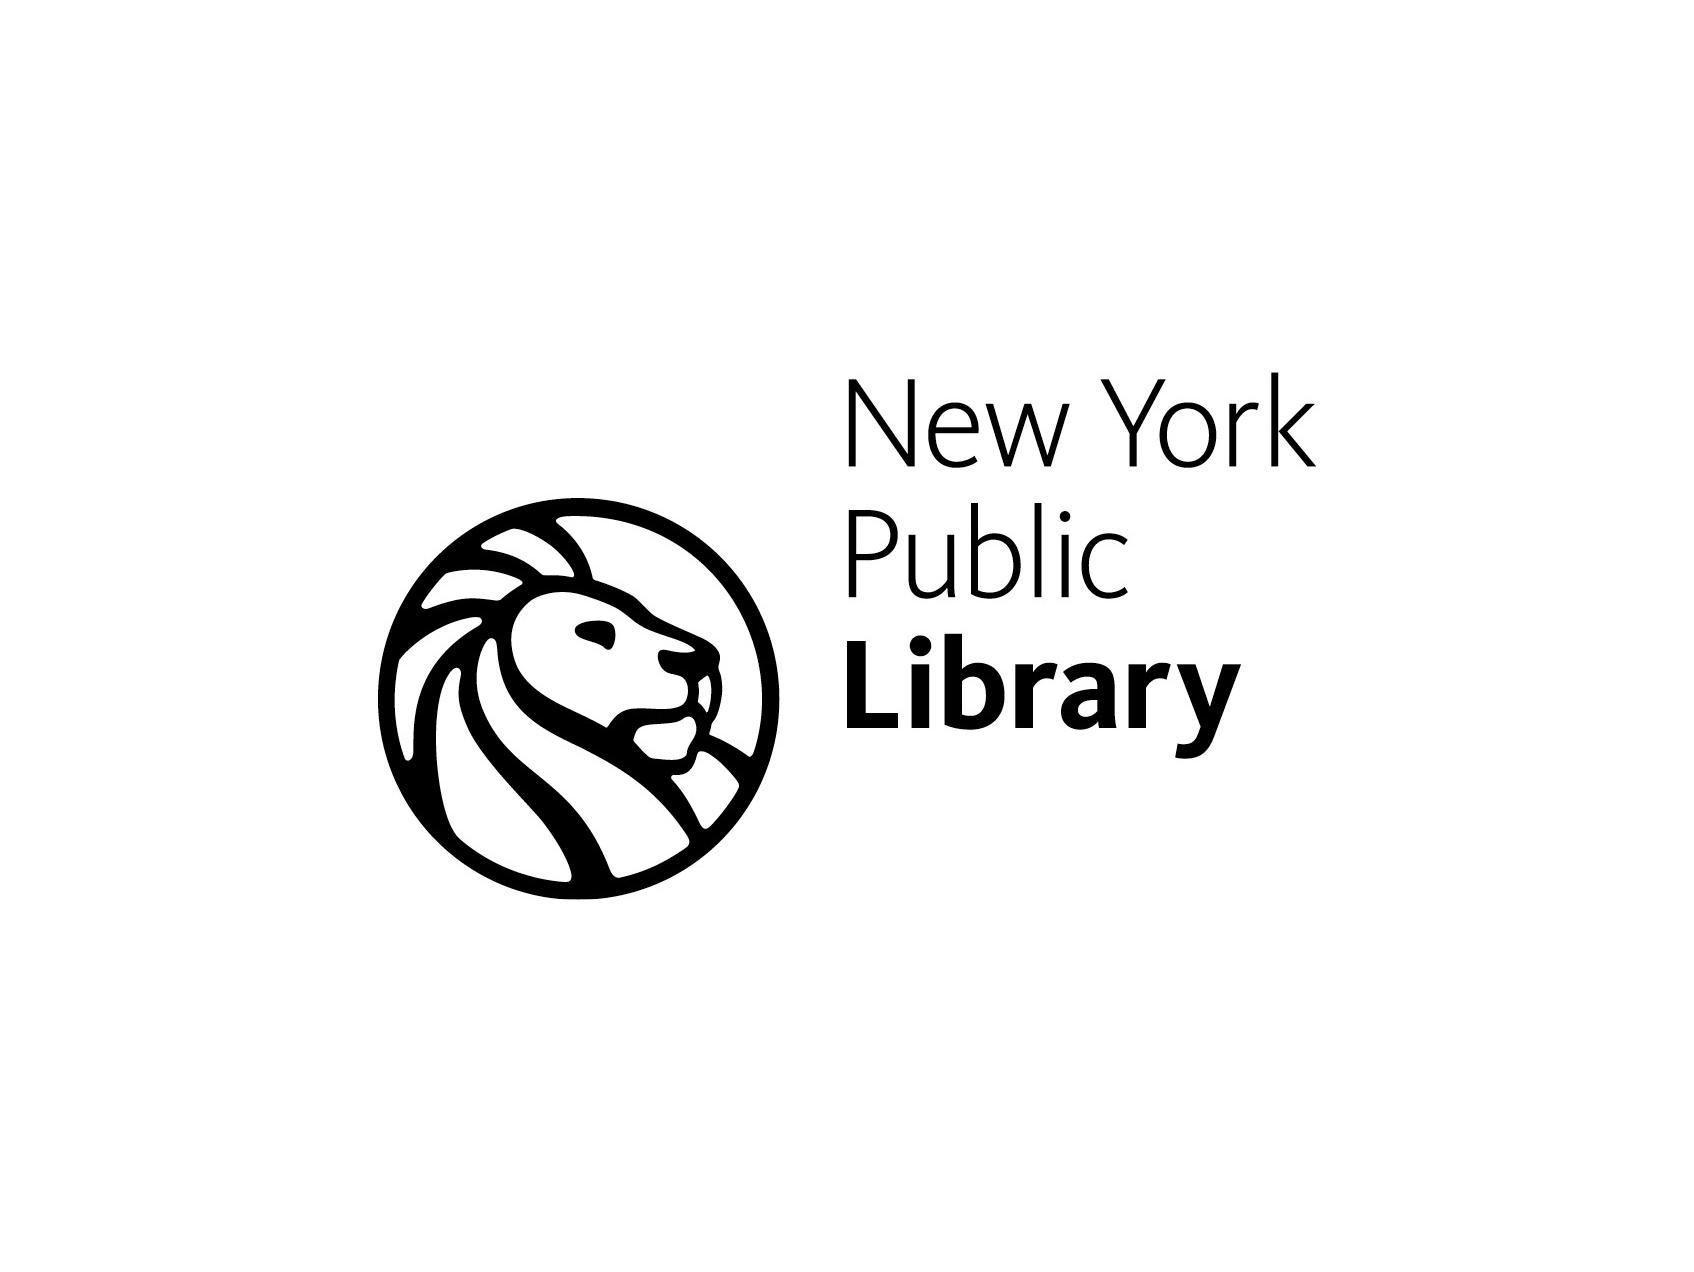 New york public library logo